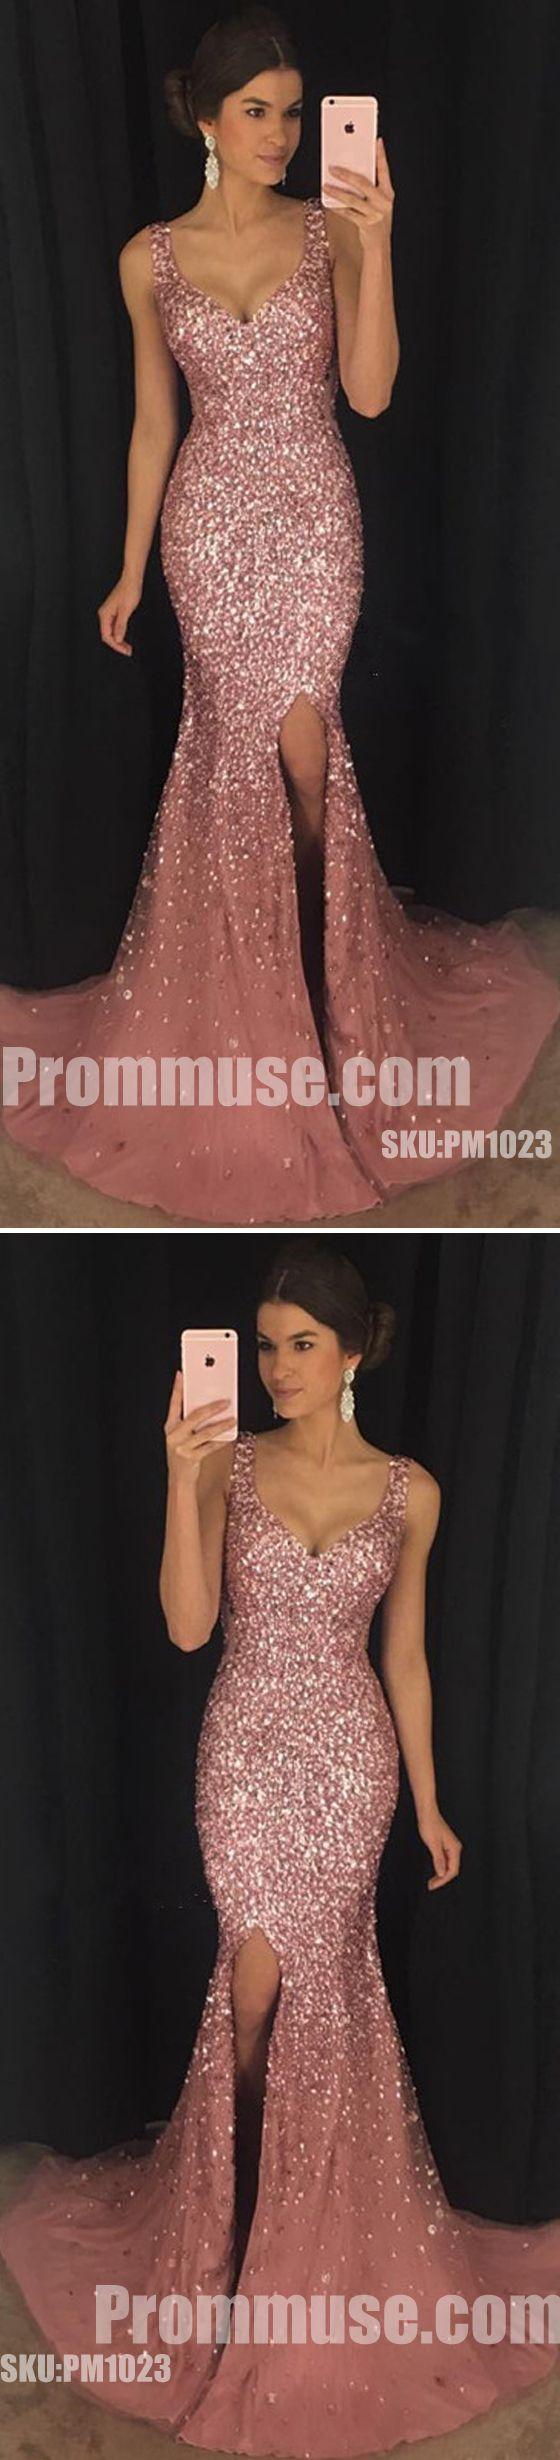 Sexy Heavy Beaded Sparkle Side Split Mermaid Long Prom Dresses, PM1023 #promdress #promdresses #longpromdress #longpromdresses #eveningdress